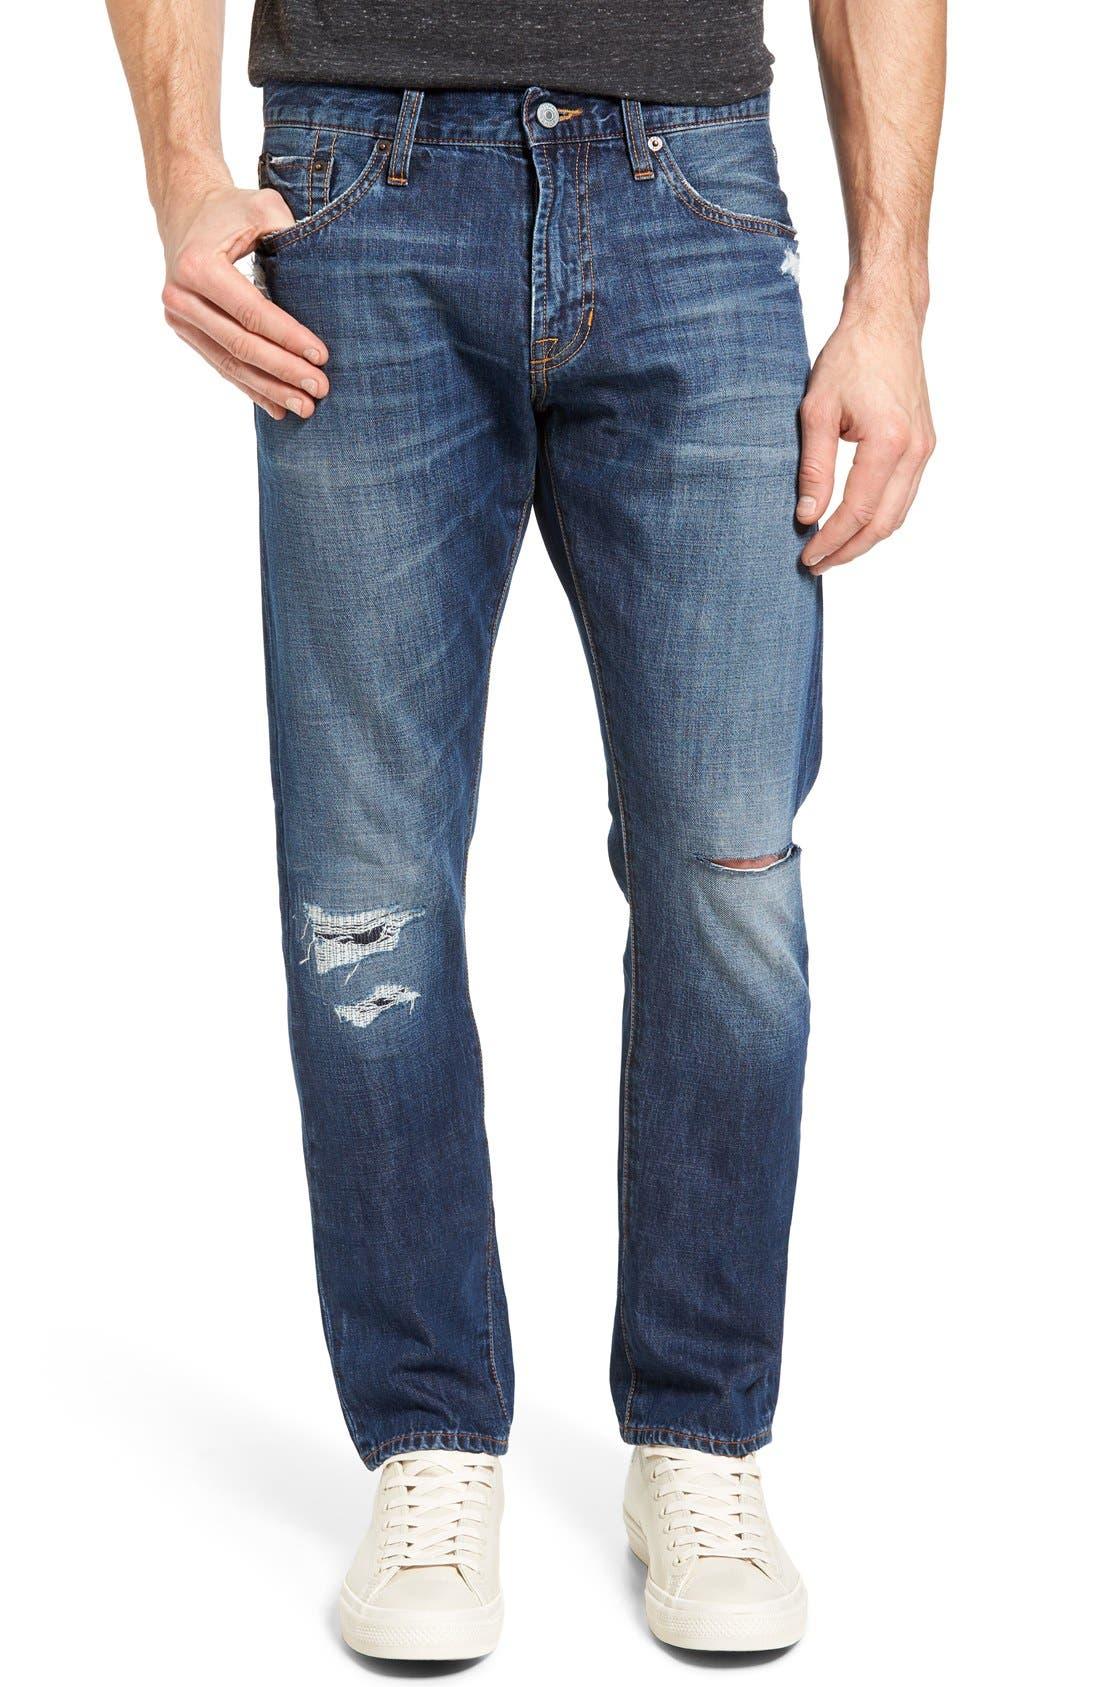 Jean Shop Slim Straight Leg Selvedge Jeans (Mid Authentic)